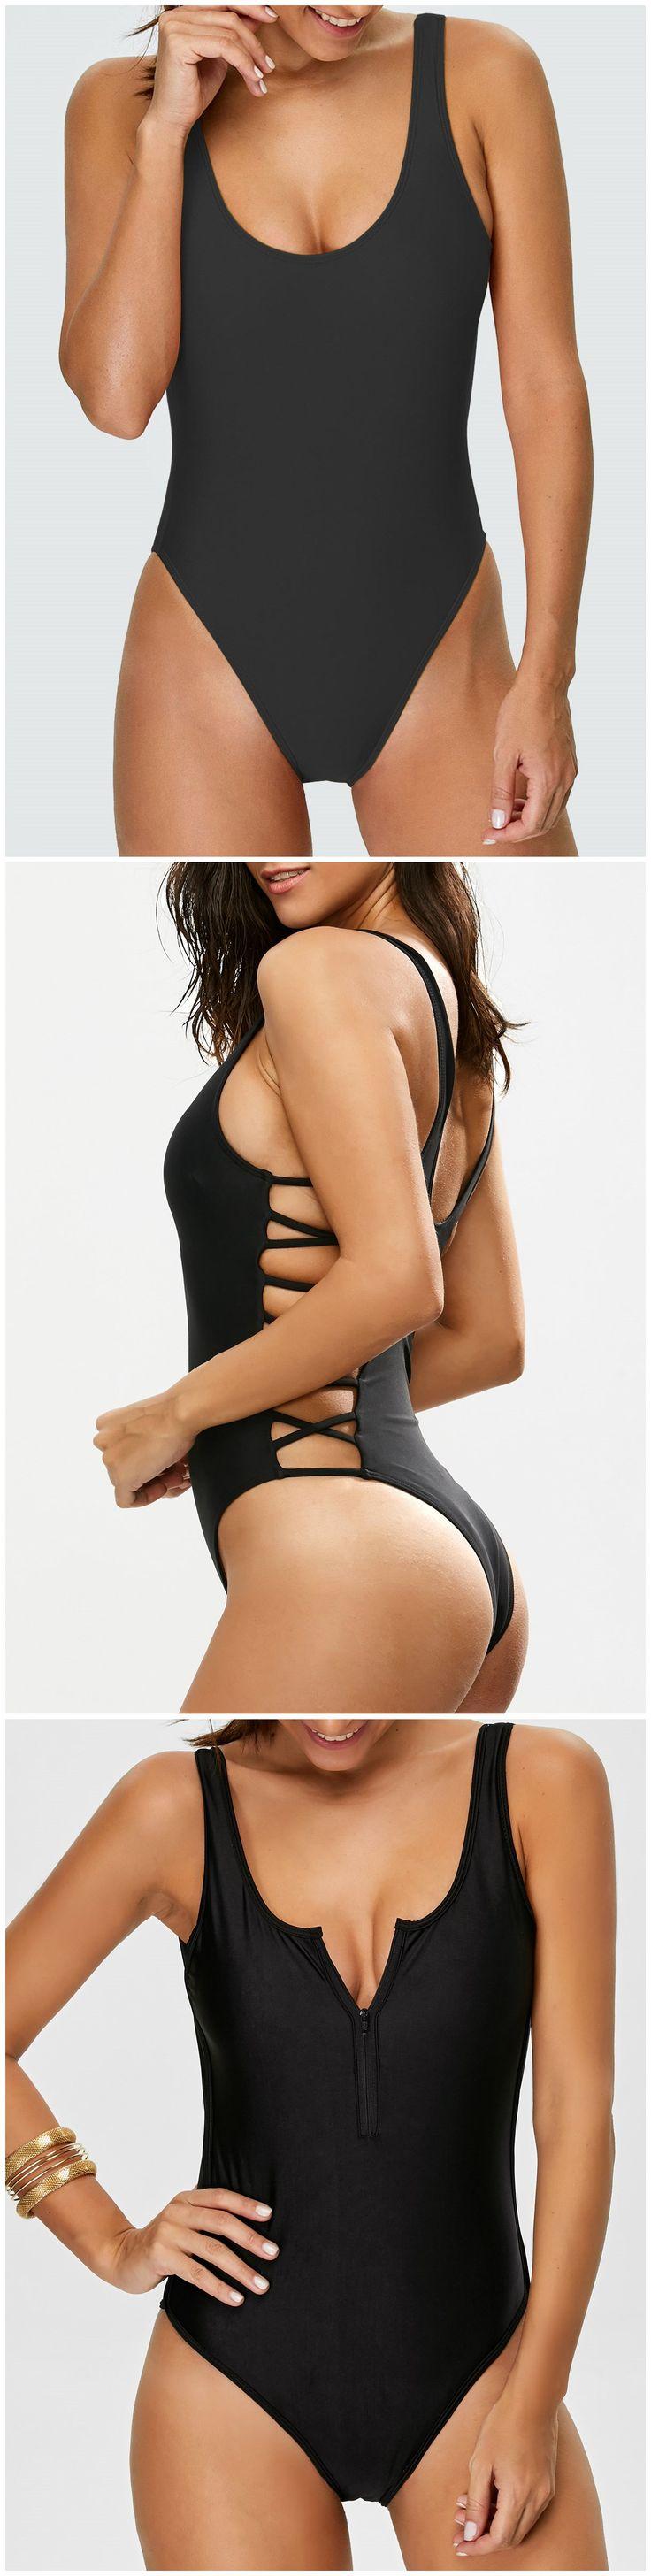 Up to 80% OFF! High Cut Backless Swimsuit. #Zaful #coverup #swimwear Zaful, zaful bikinis, zaful swimwear, style, outfits,sweater, hoodies, women fashion, summer outfits, swimwear, bikinis, micro bikini, high waisted bikini, halter bikini, crochet bikini, one piece swimwear, tankini, bikini set, cover ups, bathing suit, swimsuits, summer fashion, summer outfits, Christmas, ugly Christmas, Thanksgiving, Gift, New Year Eve, New Year 2017. @zaful Extra 10% OFF Code:ZF2017